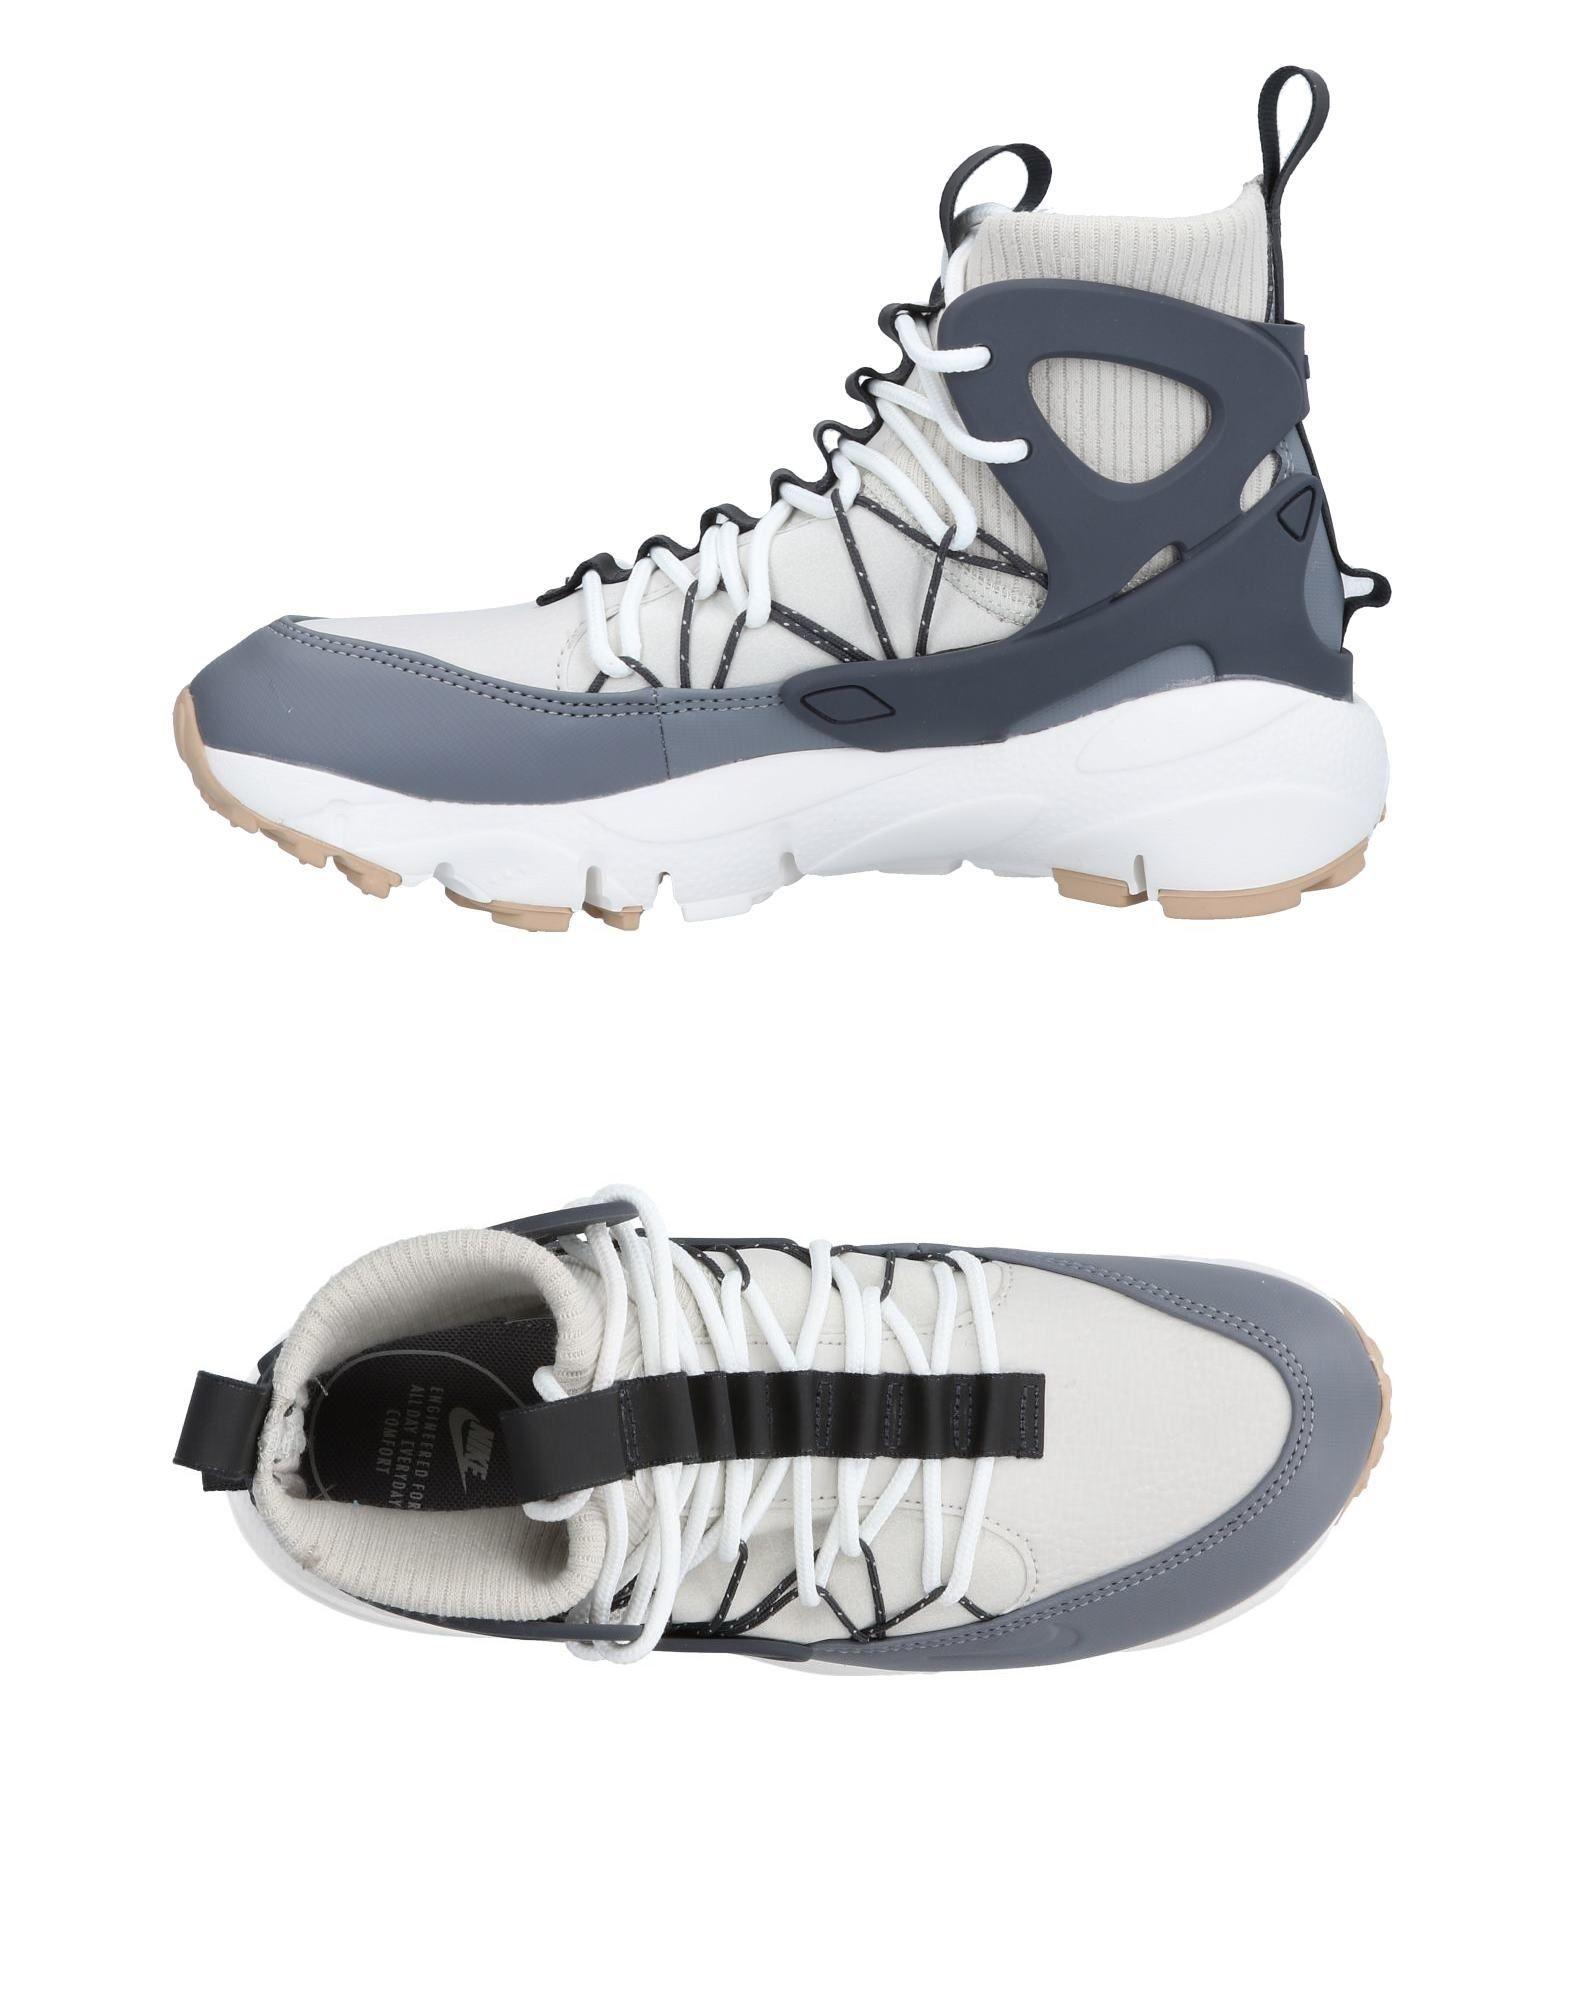 Moda Sneakers Nike Donna - 11498697XO